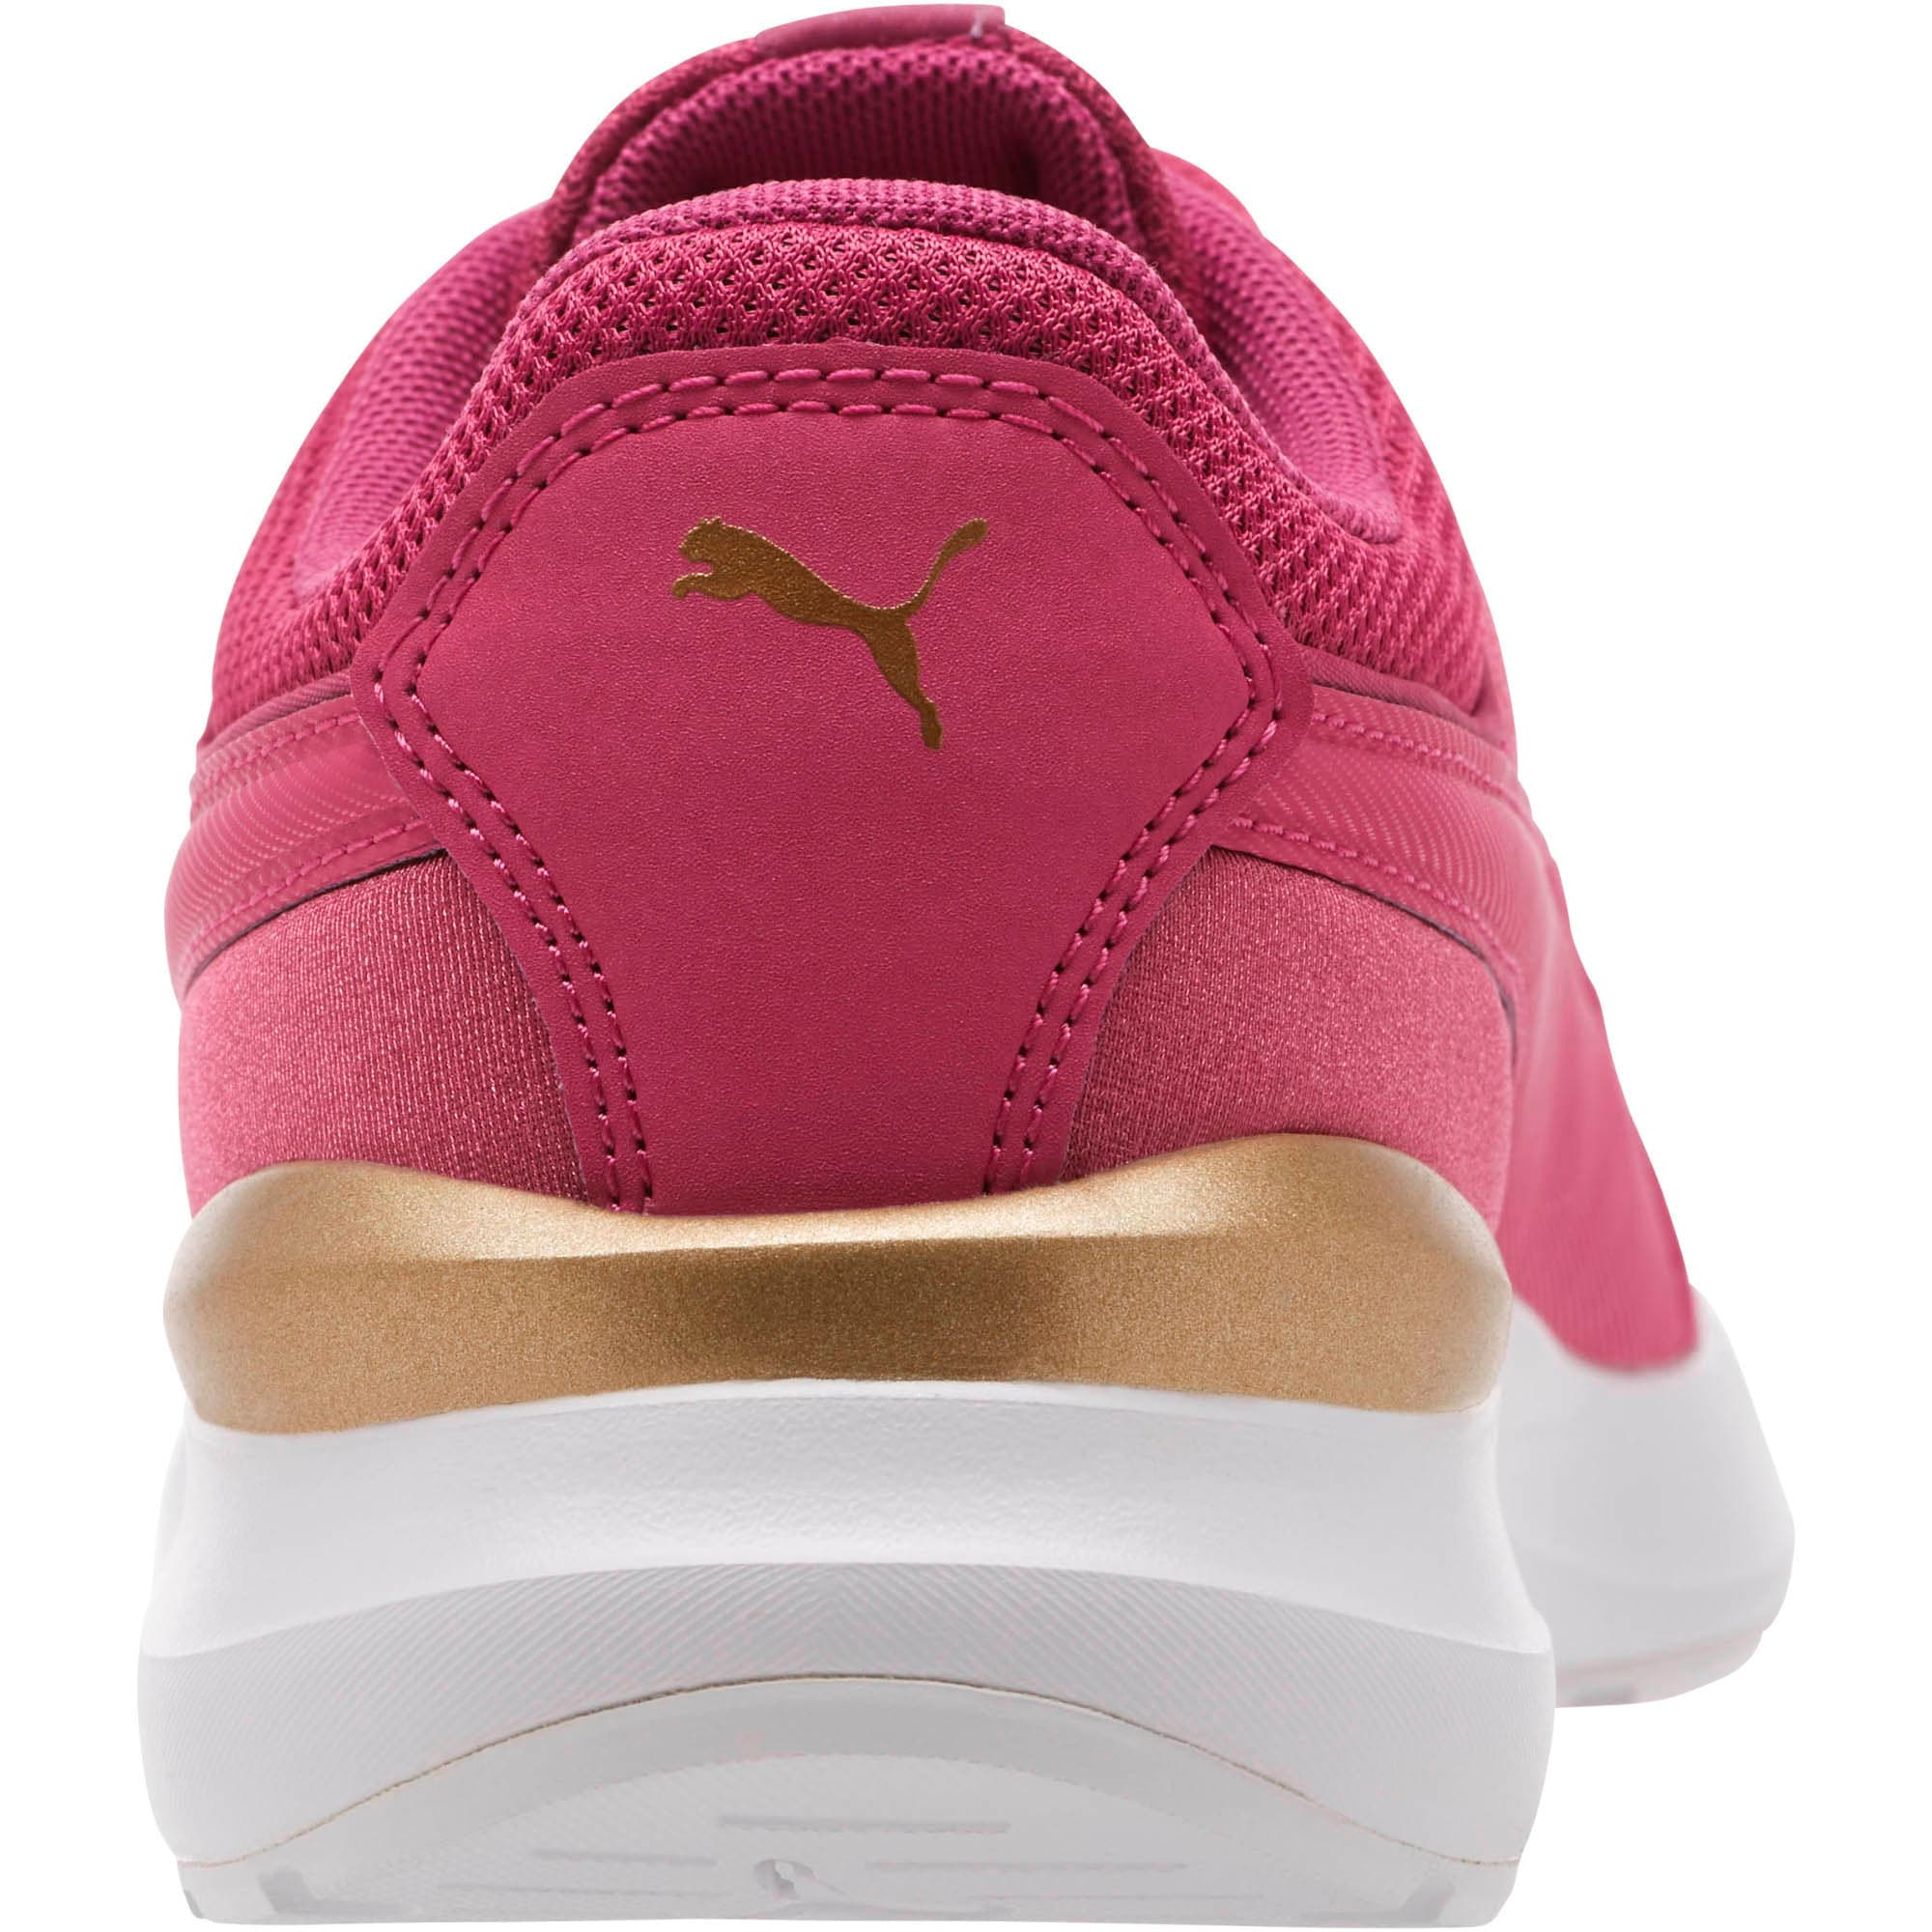 Thumbnail 4 of Adela Women's Sneakers, Magenta Haze-Magenta Haze, medium